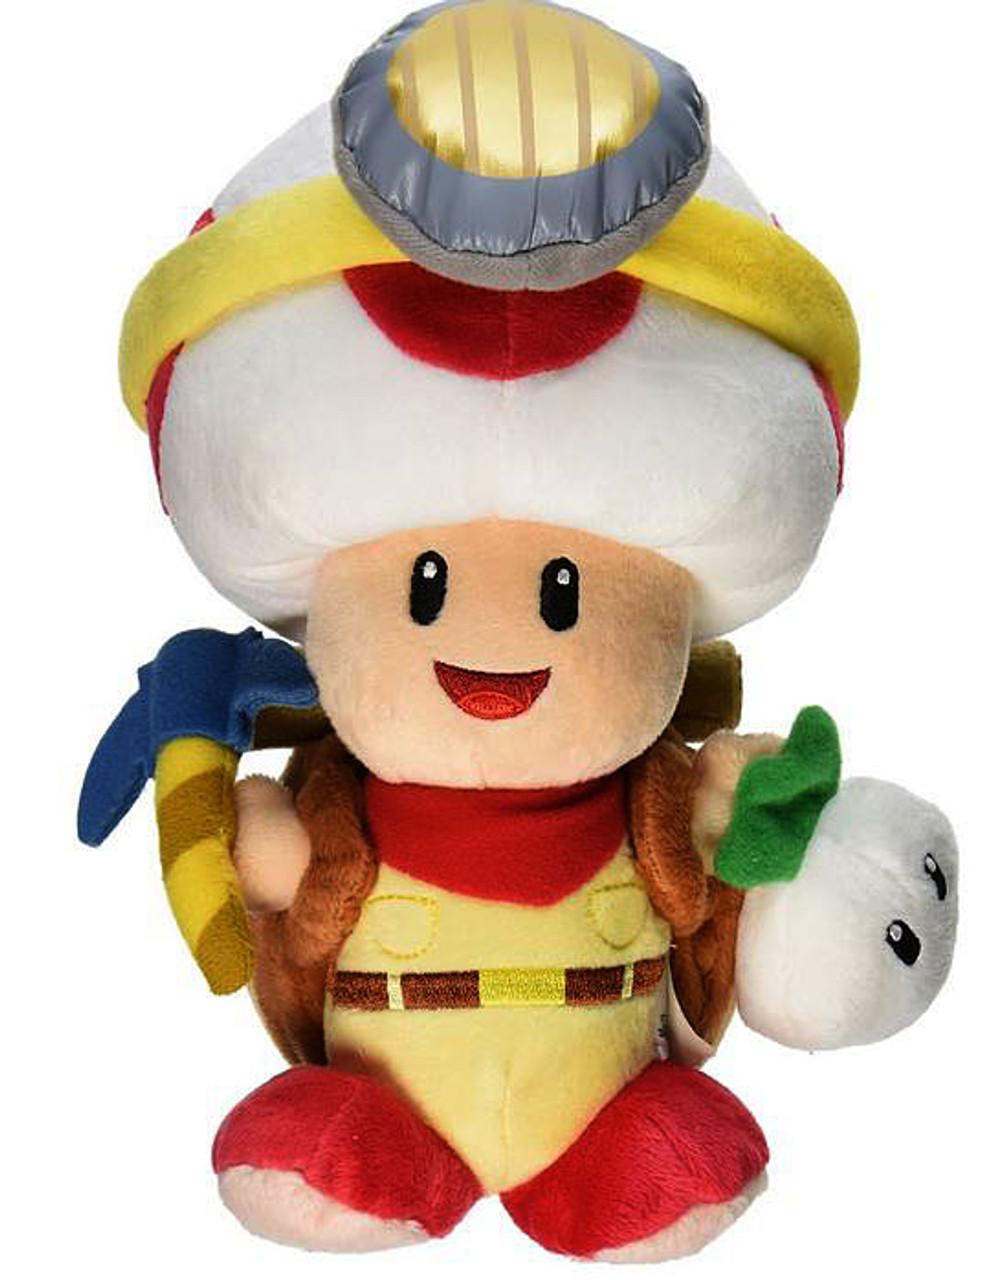 9 inch Plush Toy Mario Super Mario Bros